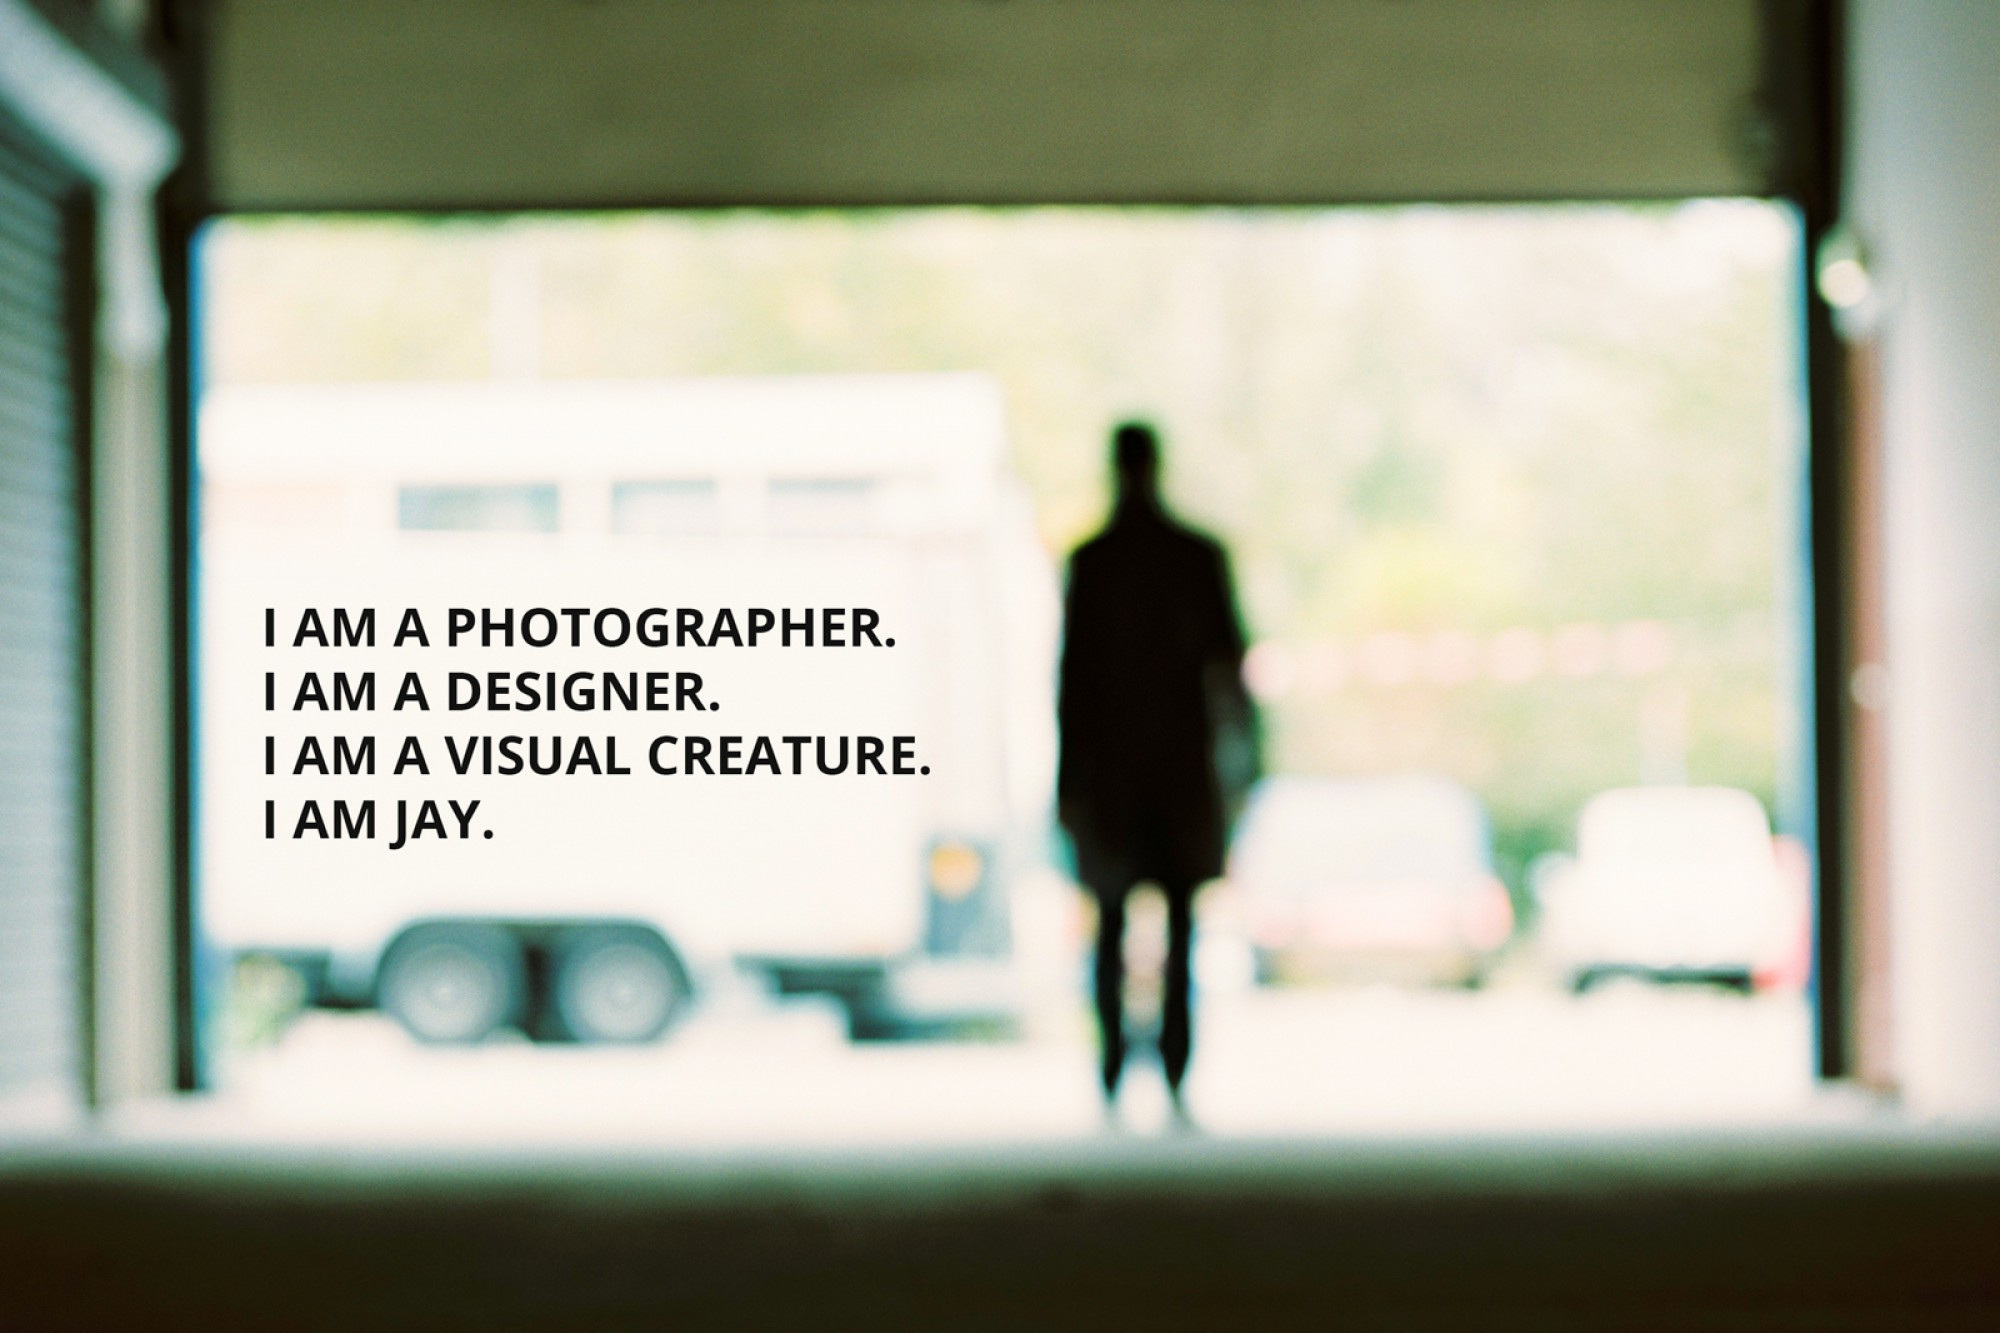 I am a photographer. I am a designer. I am a visual creature. I am Jay.